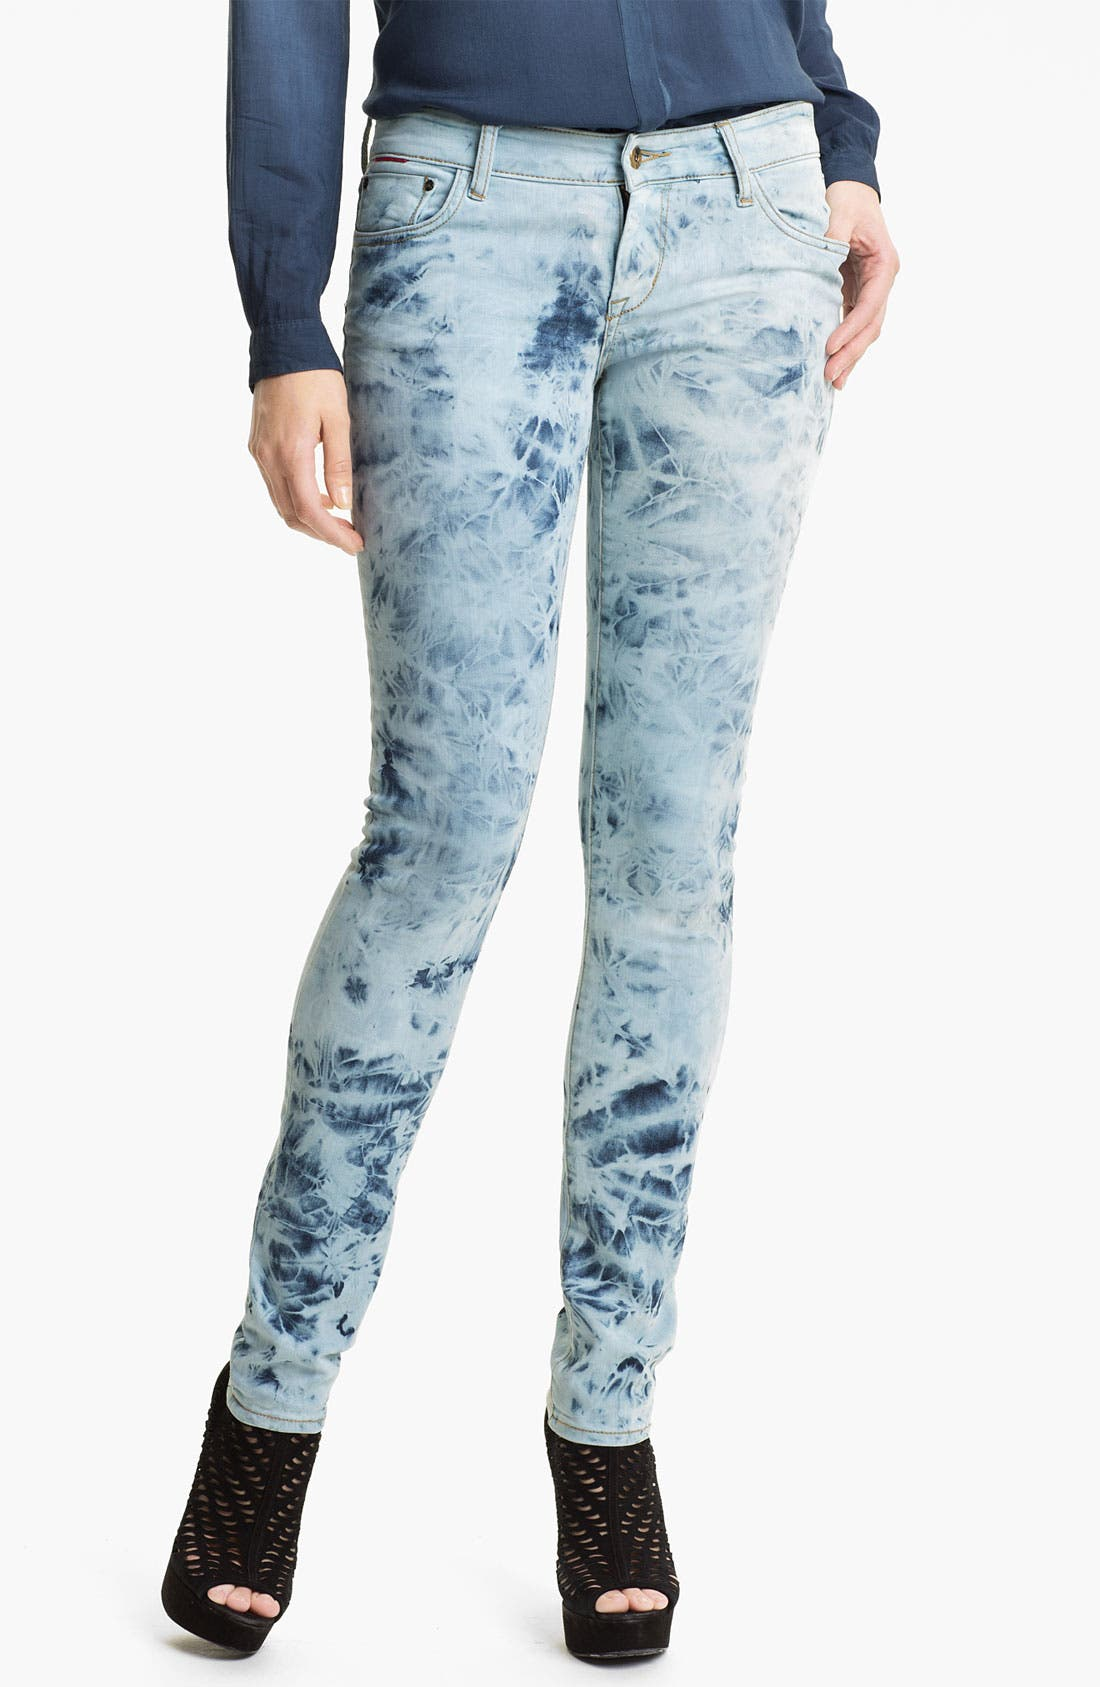 Main Image - !iT Collective Tie Dye Skinny Jeans (Activist) (Online Exclusive)